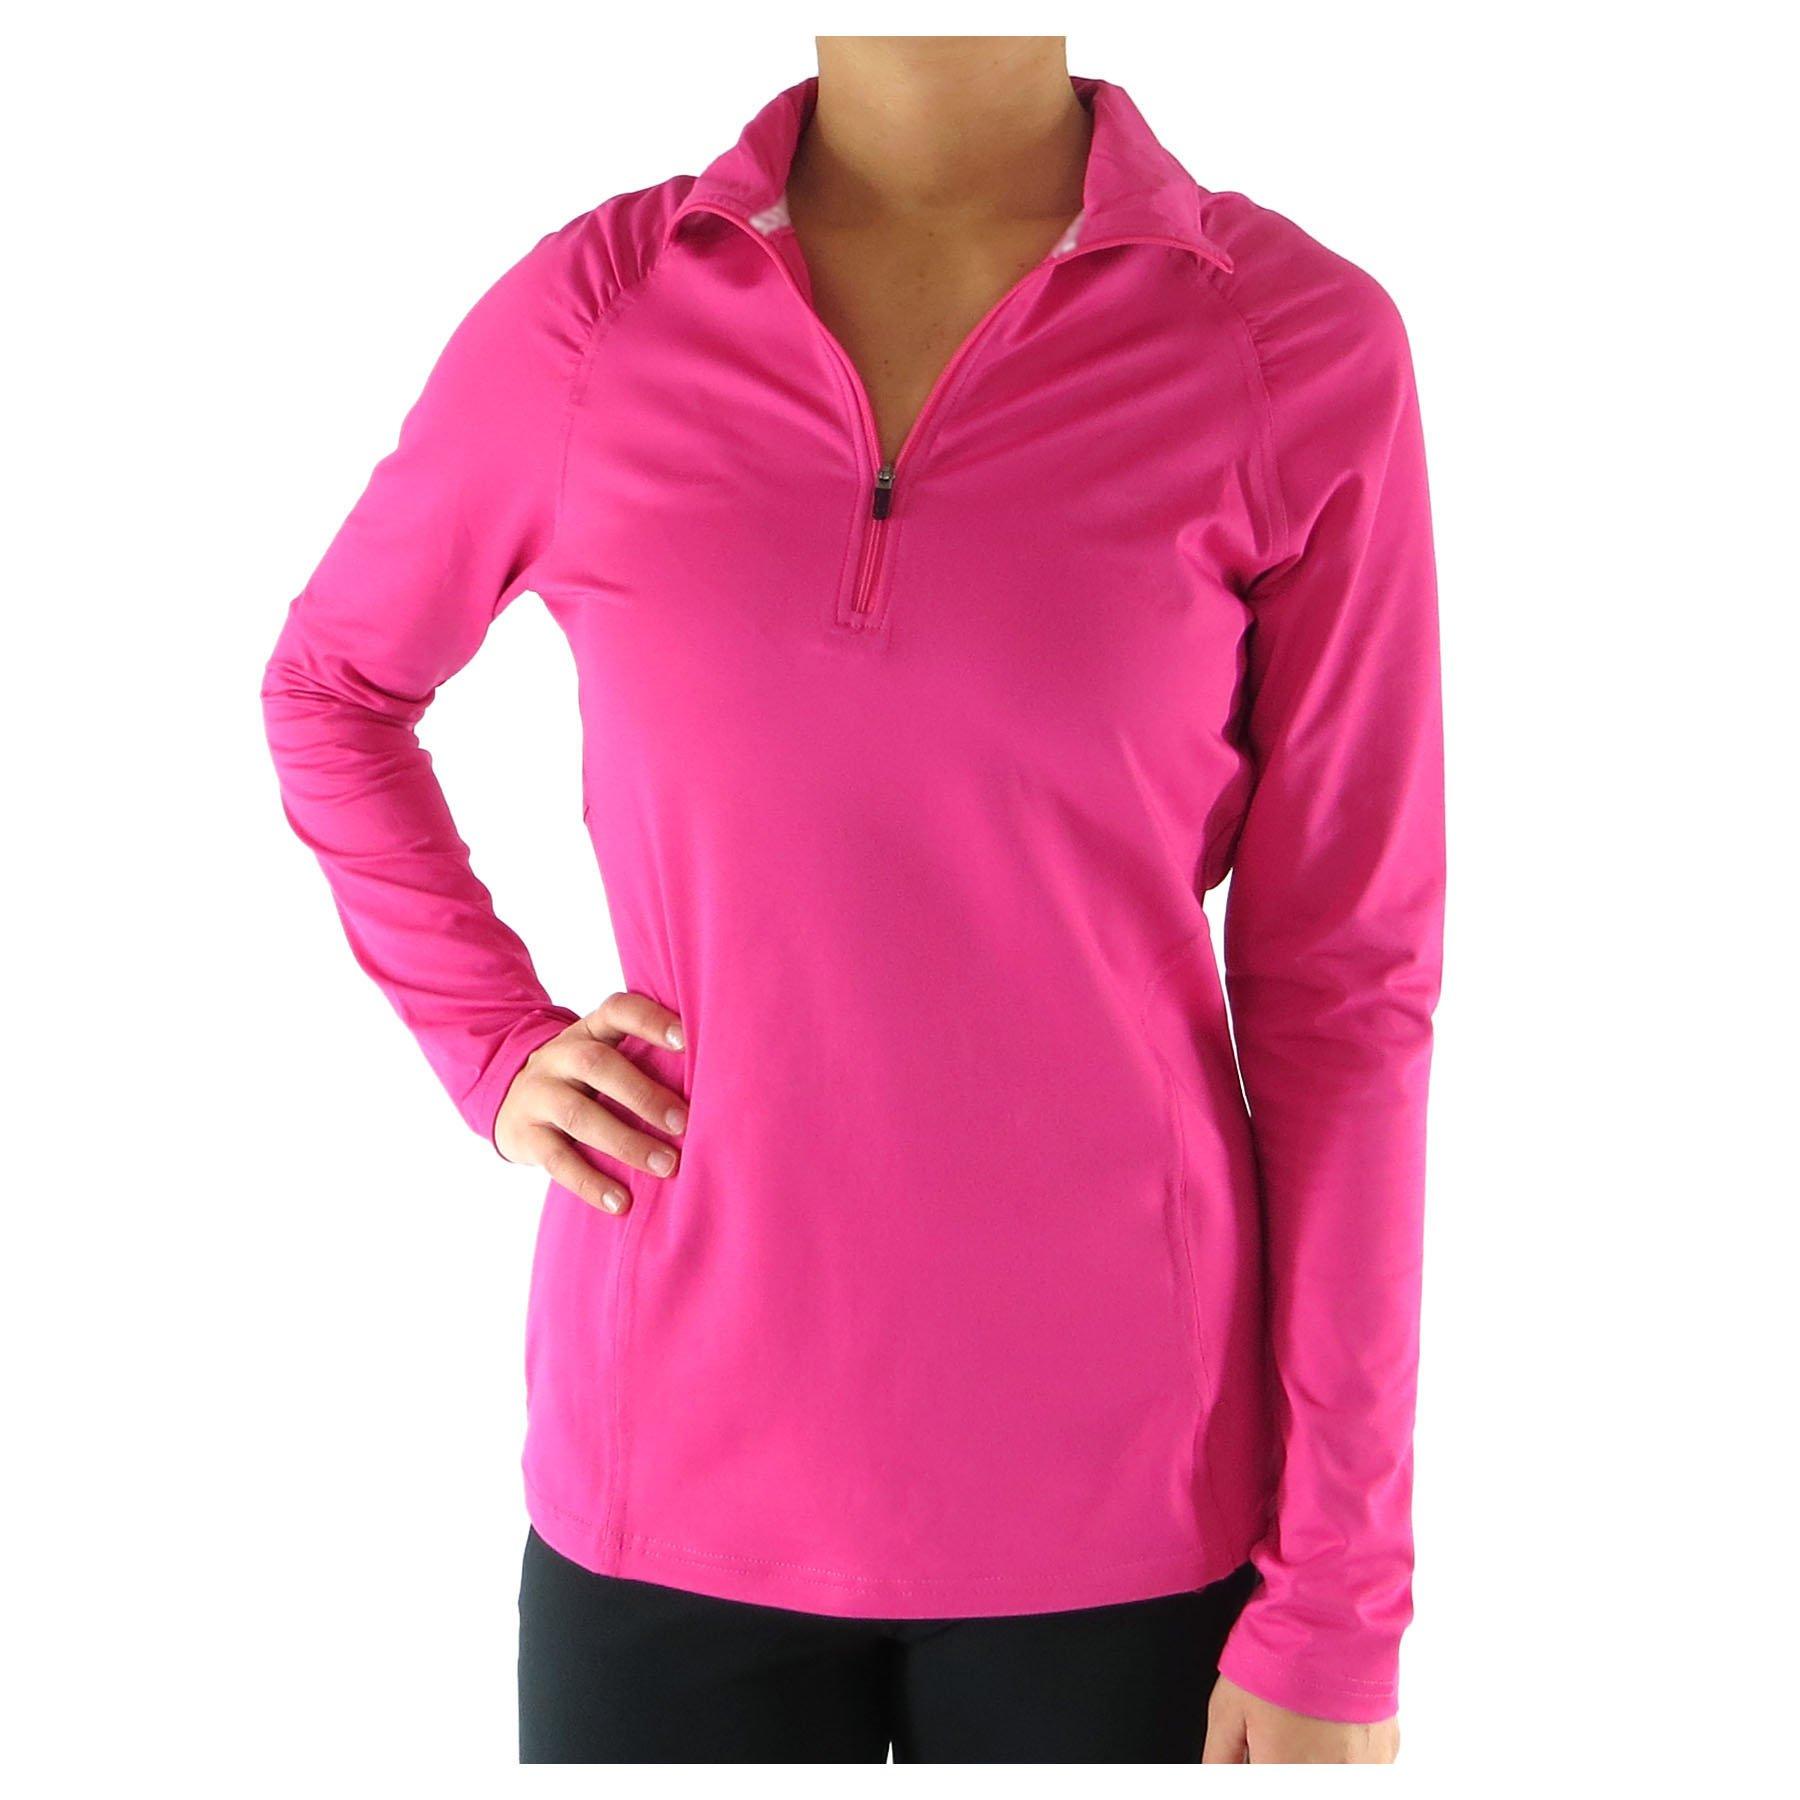 Alex + Abby Women's Essential Pullover X-Small Zuma Pink